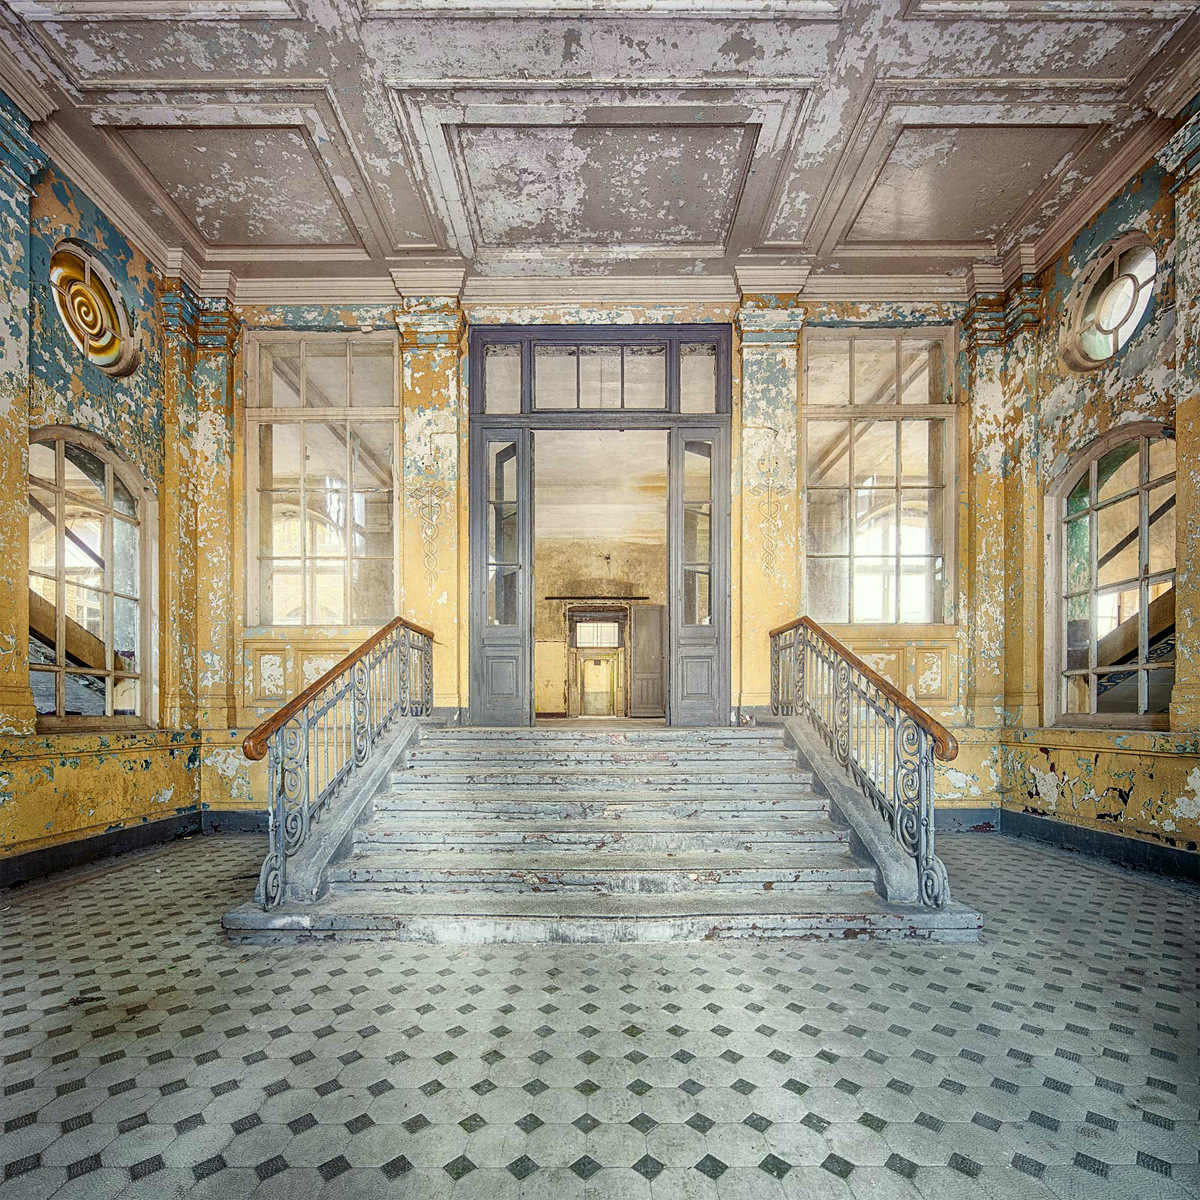 Decay series IV by Markus Studtmann